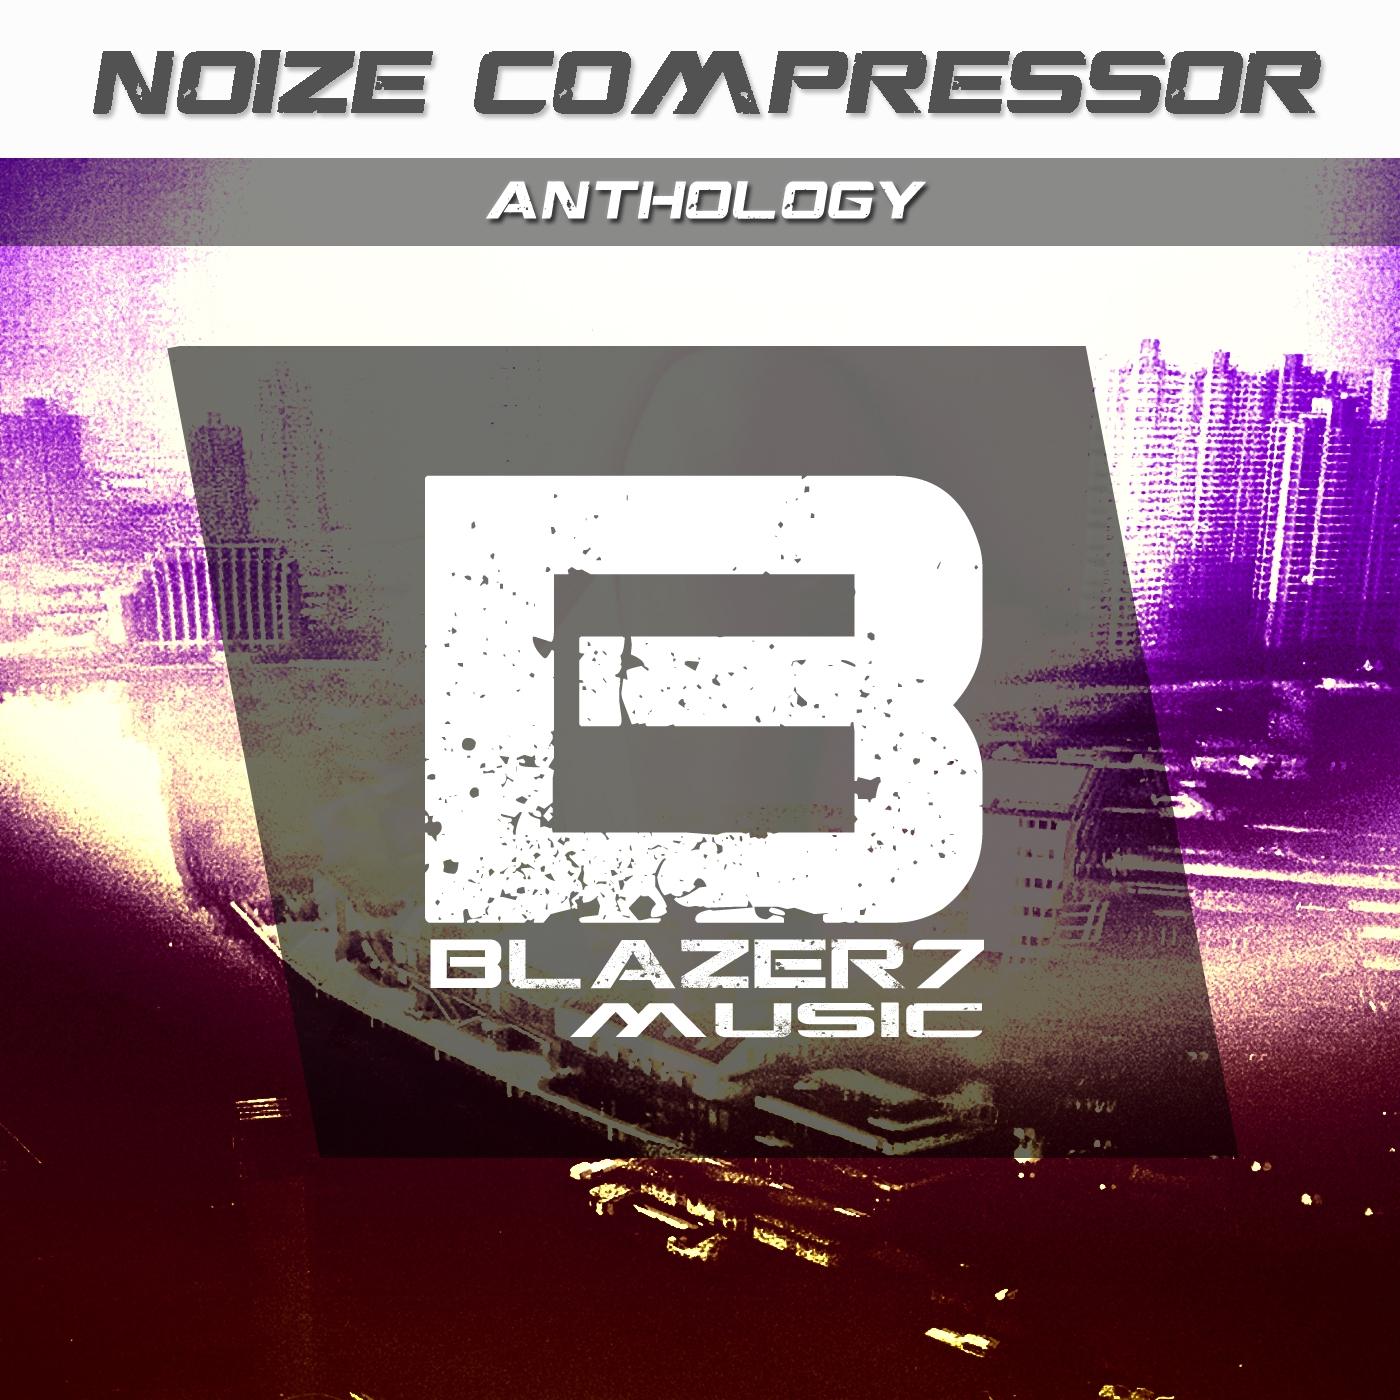 Noize Compressor - Diffusion Sax (Original Mix)